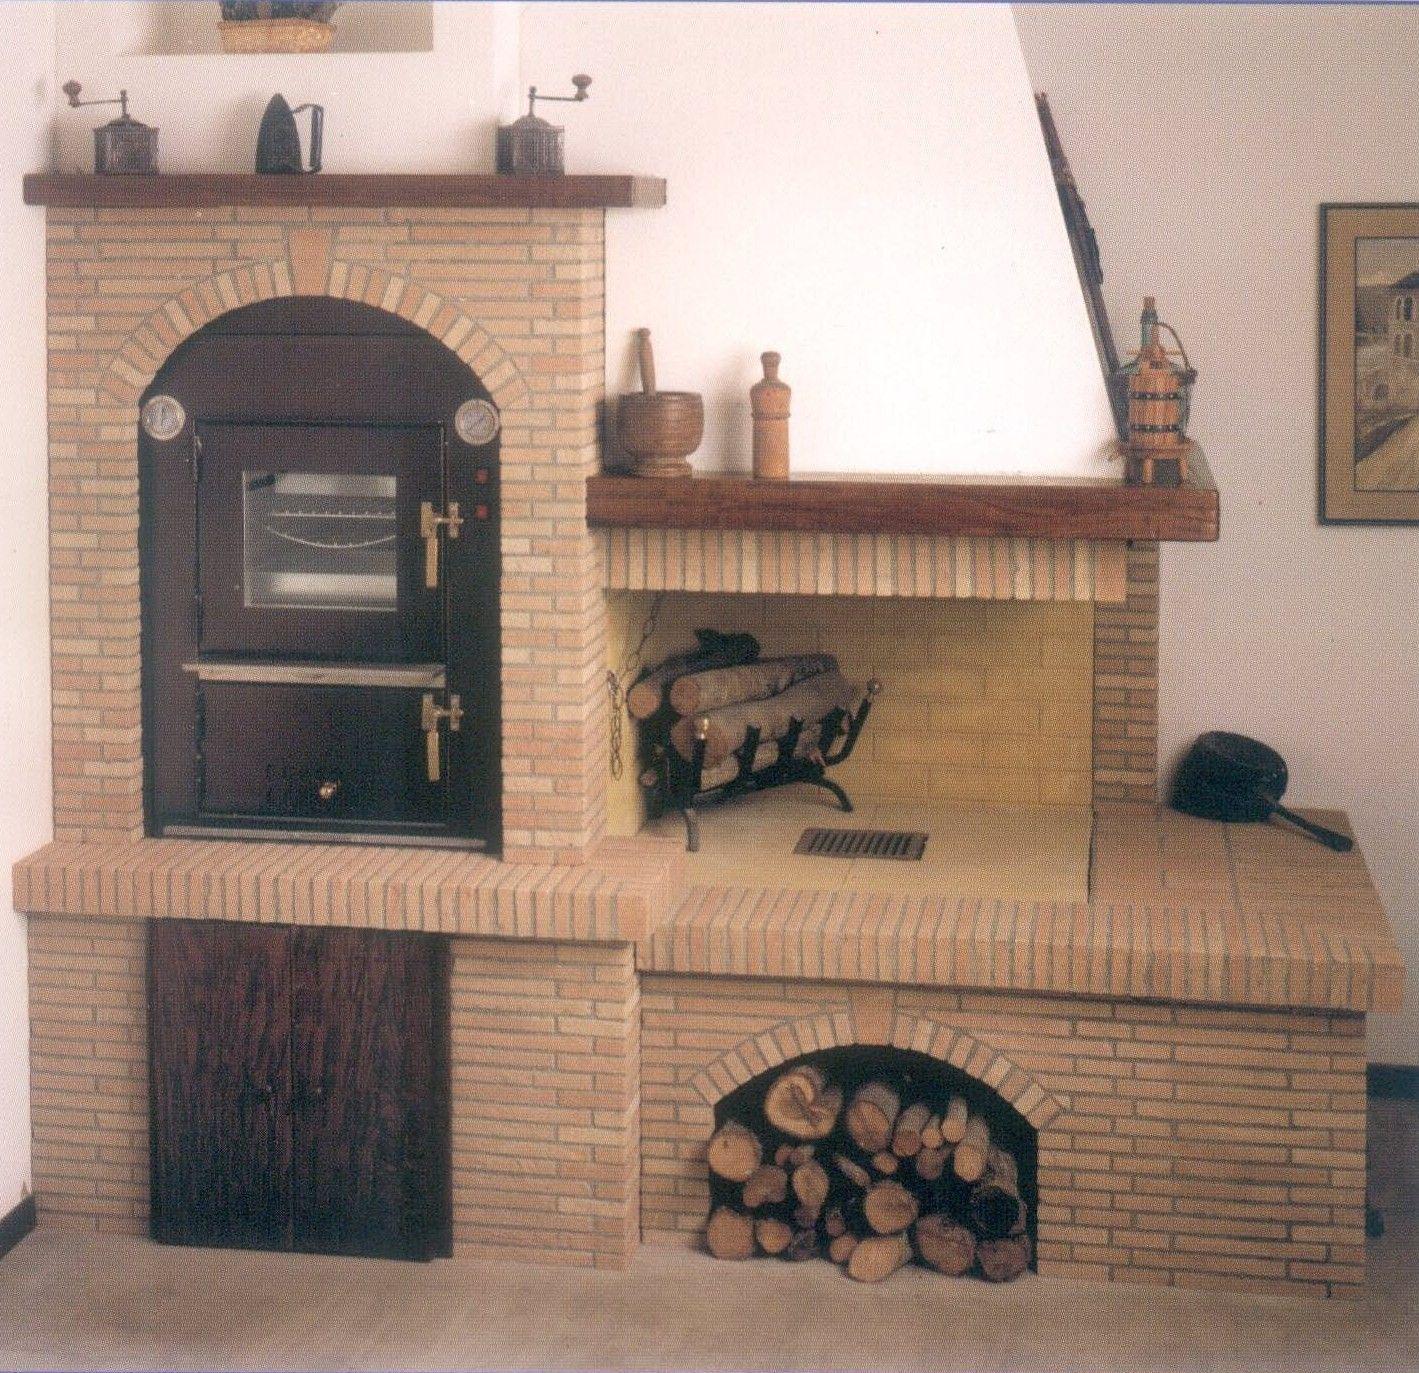 Forno da incasso cucina rustica pinterest camini - Cucine a legna da incasso ...